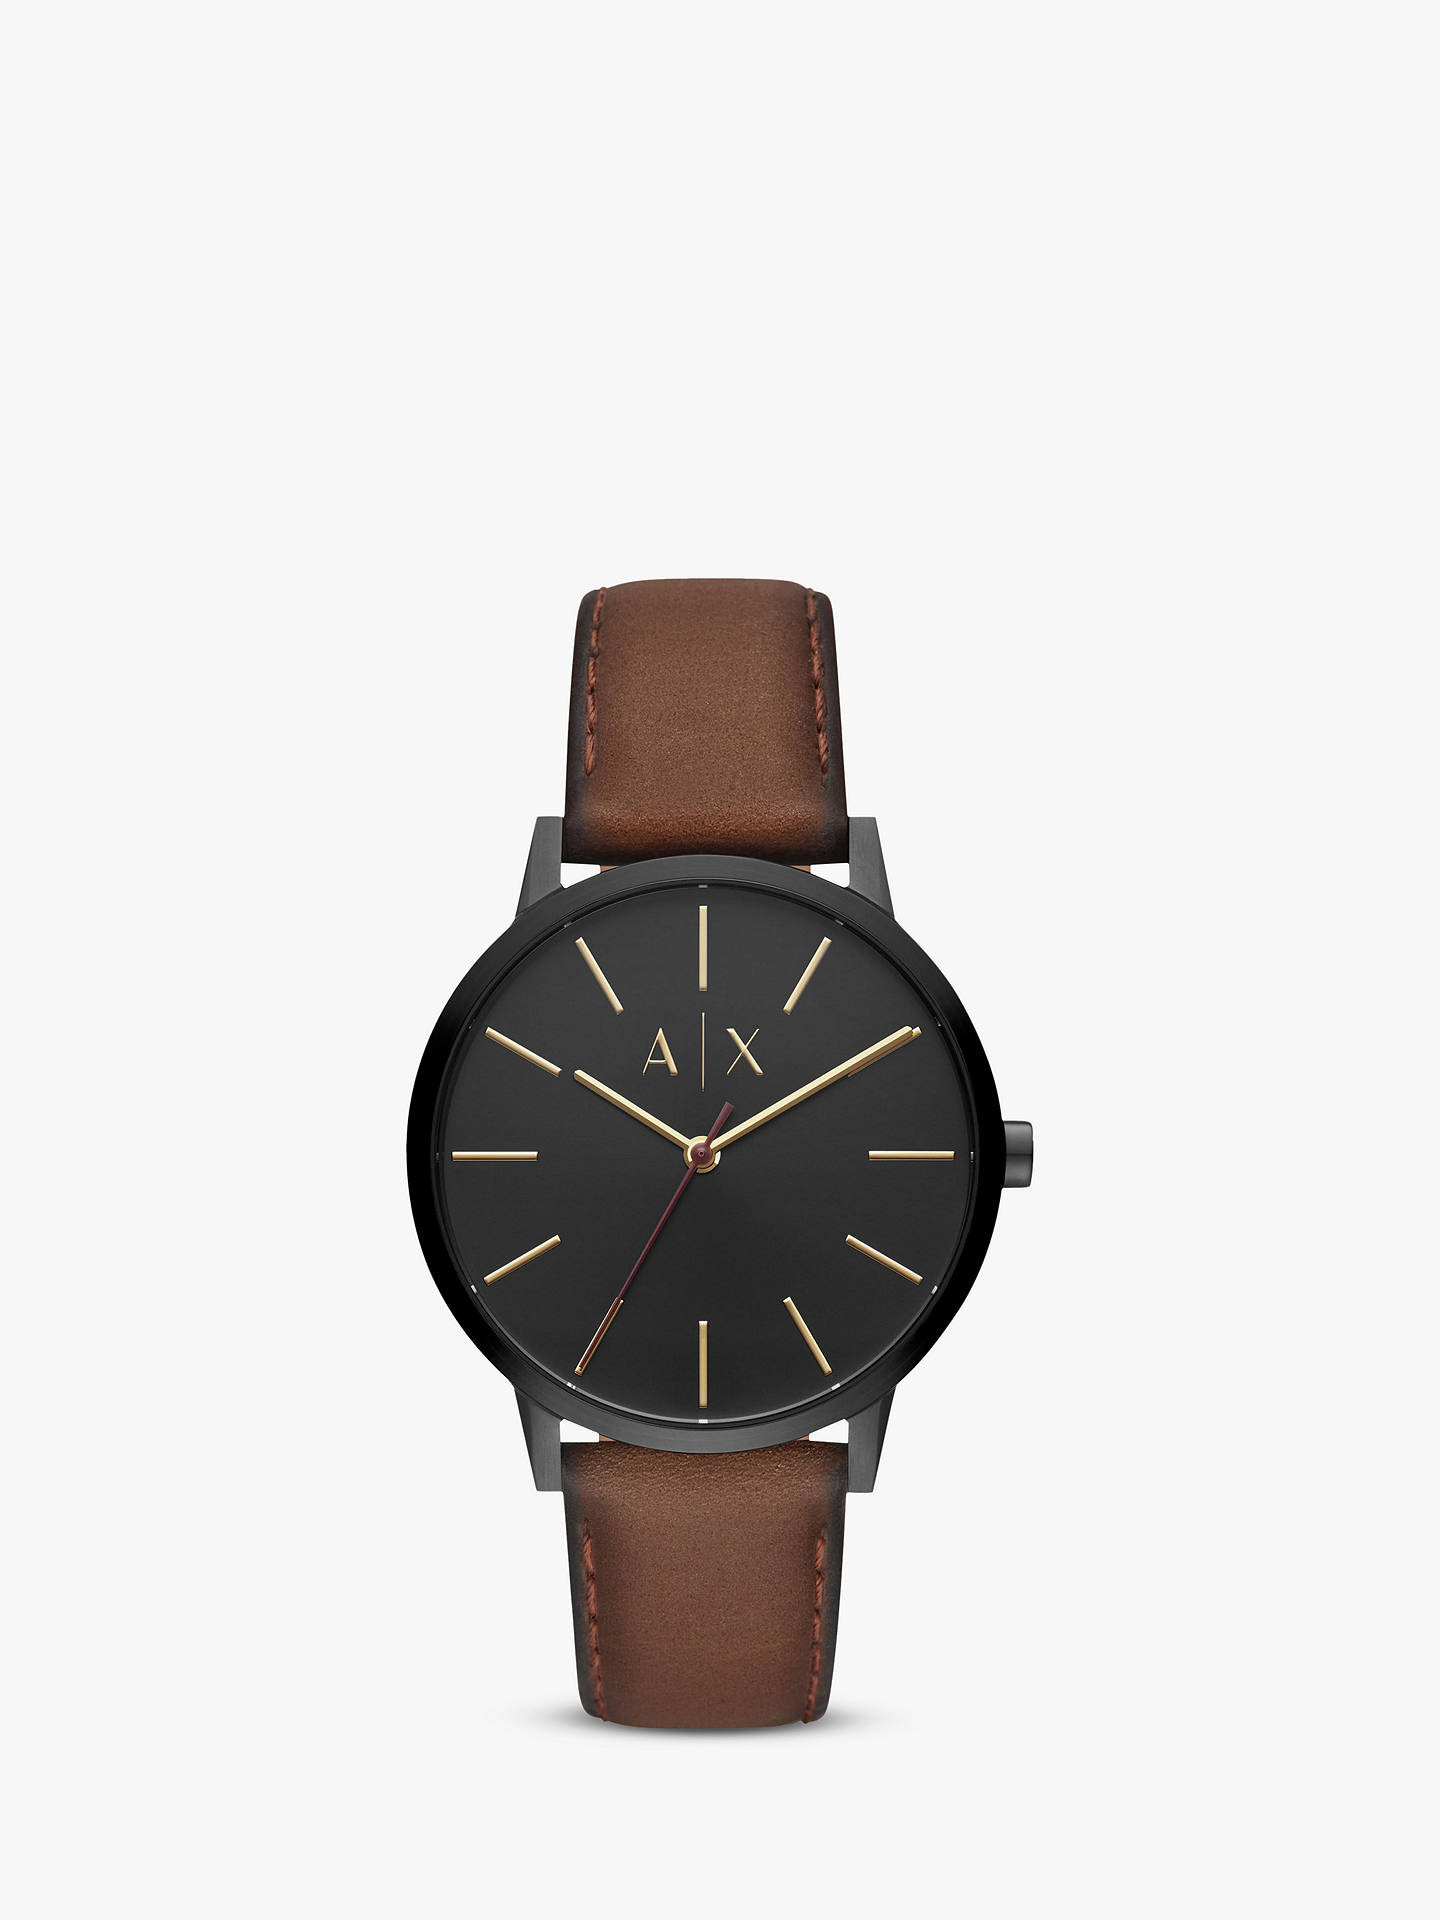 421790650 Armani Exchange Men s Leather Strap Watch at John Lewis   Partners